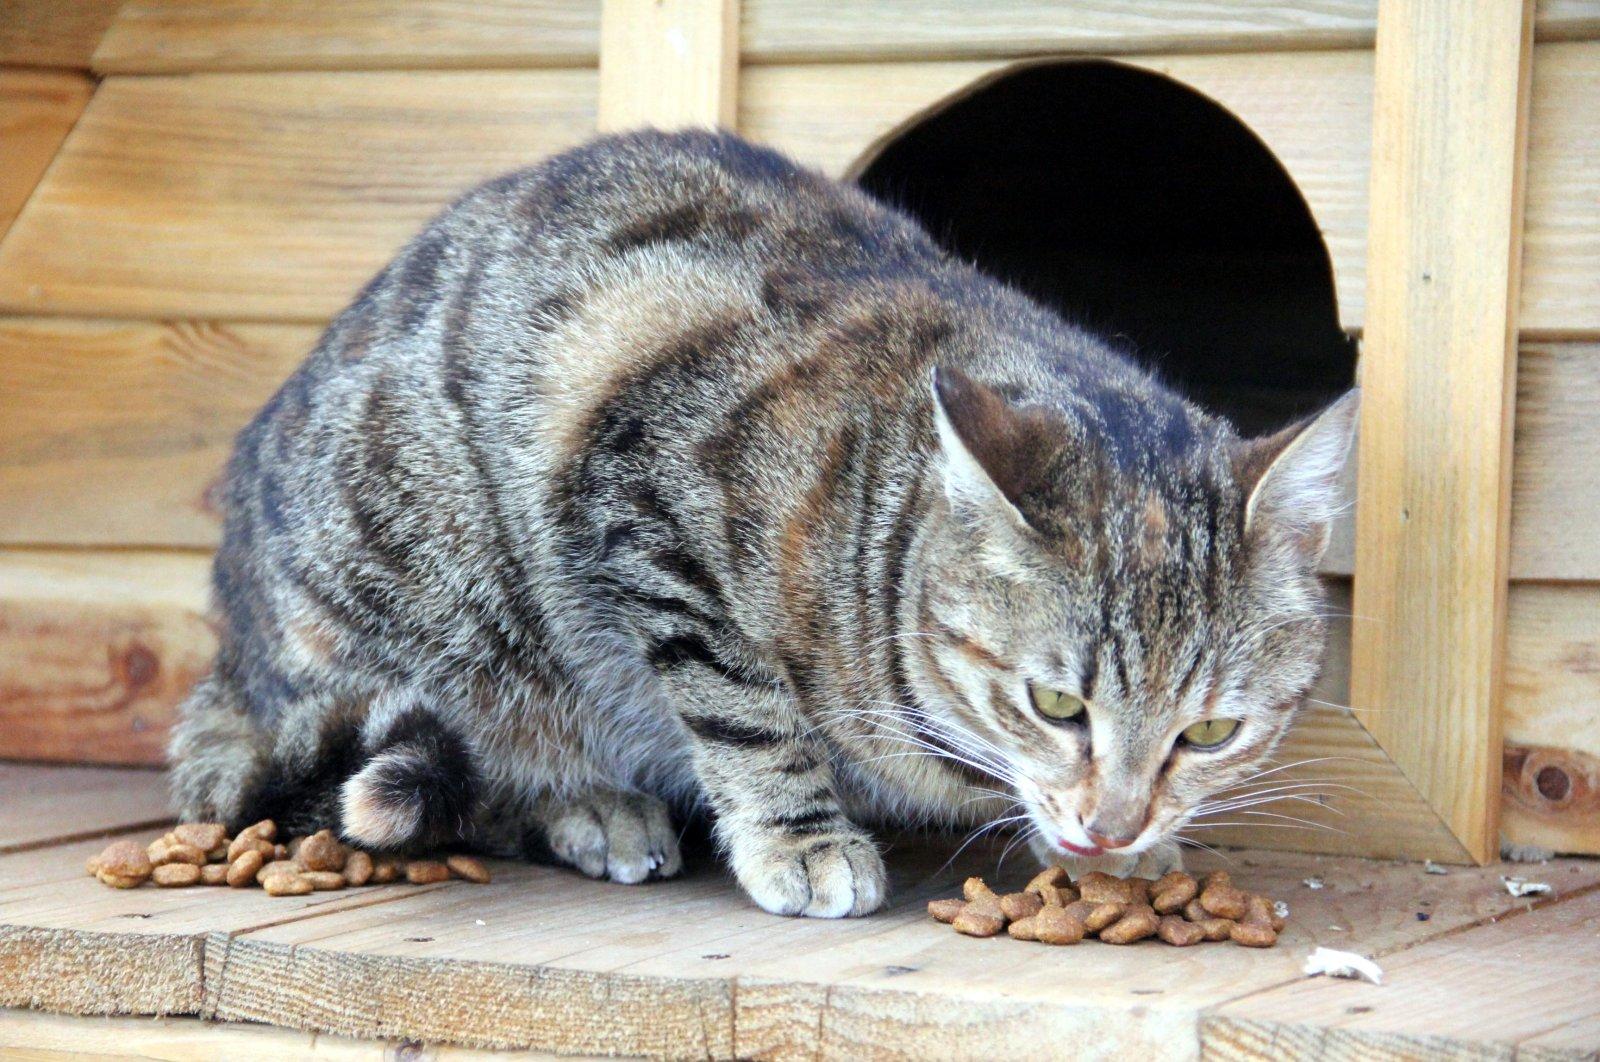 A cat enjoys its meal left by village head of Karaçayır neighborhood, in Bolu, on April 11, 2020. (DHA Photo)